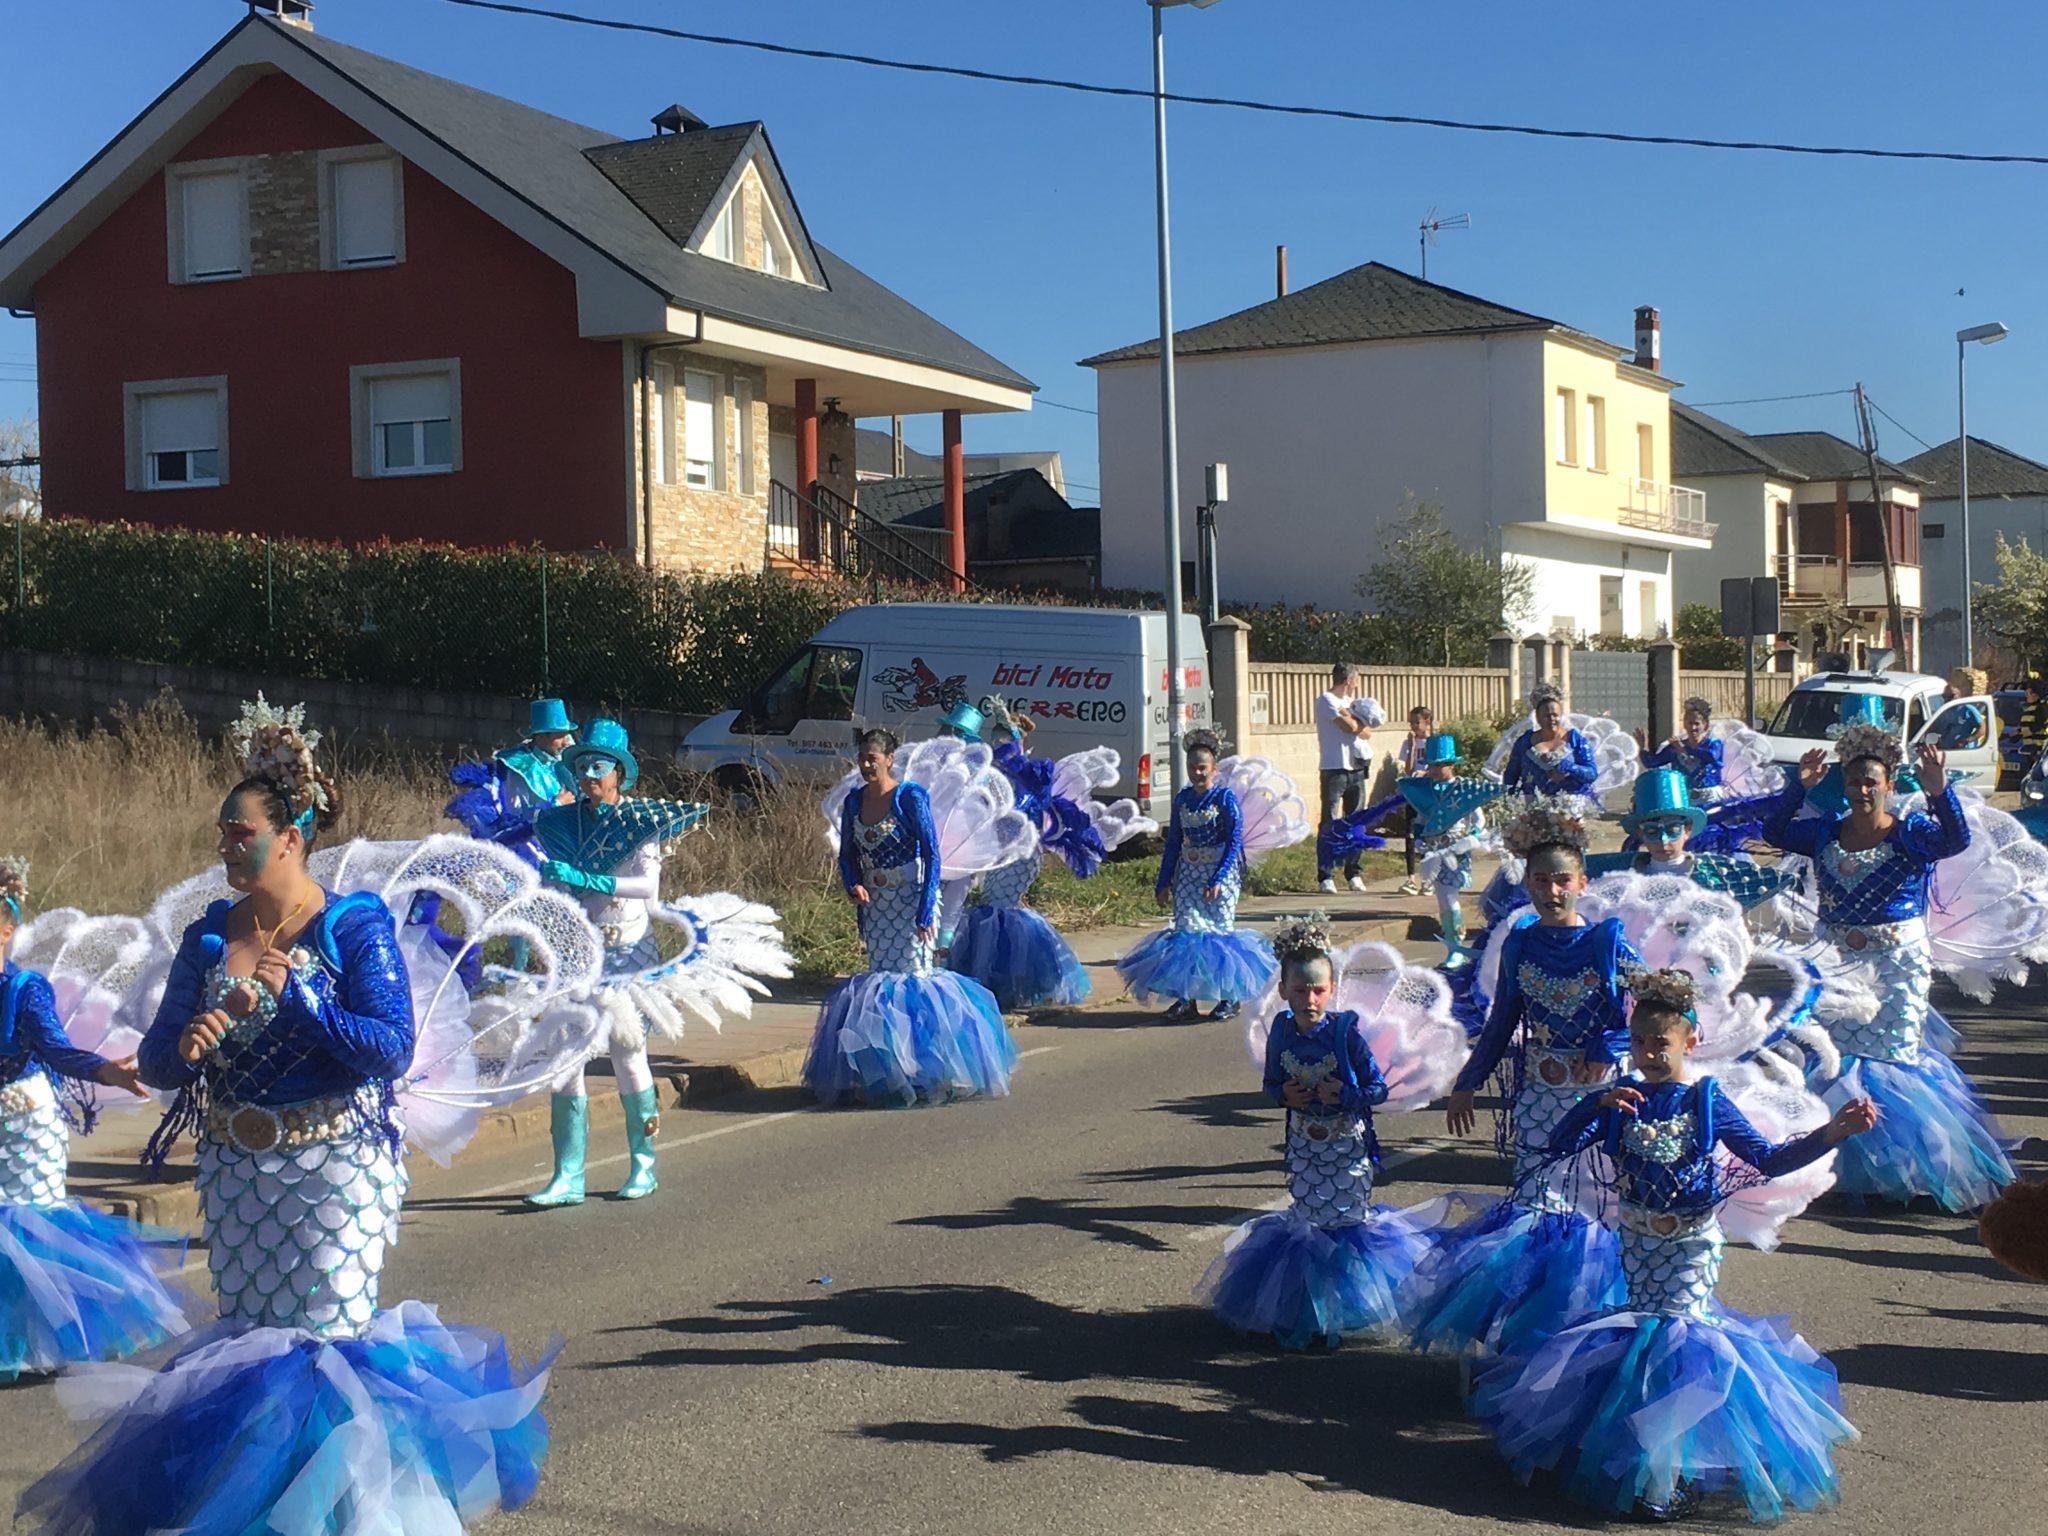 Álbum de fotos Carnaval Cabañas Raras 2019 22